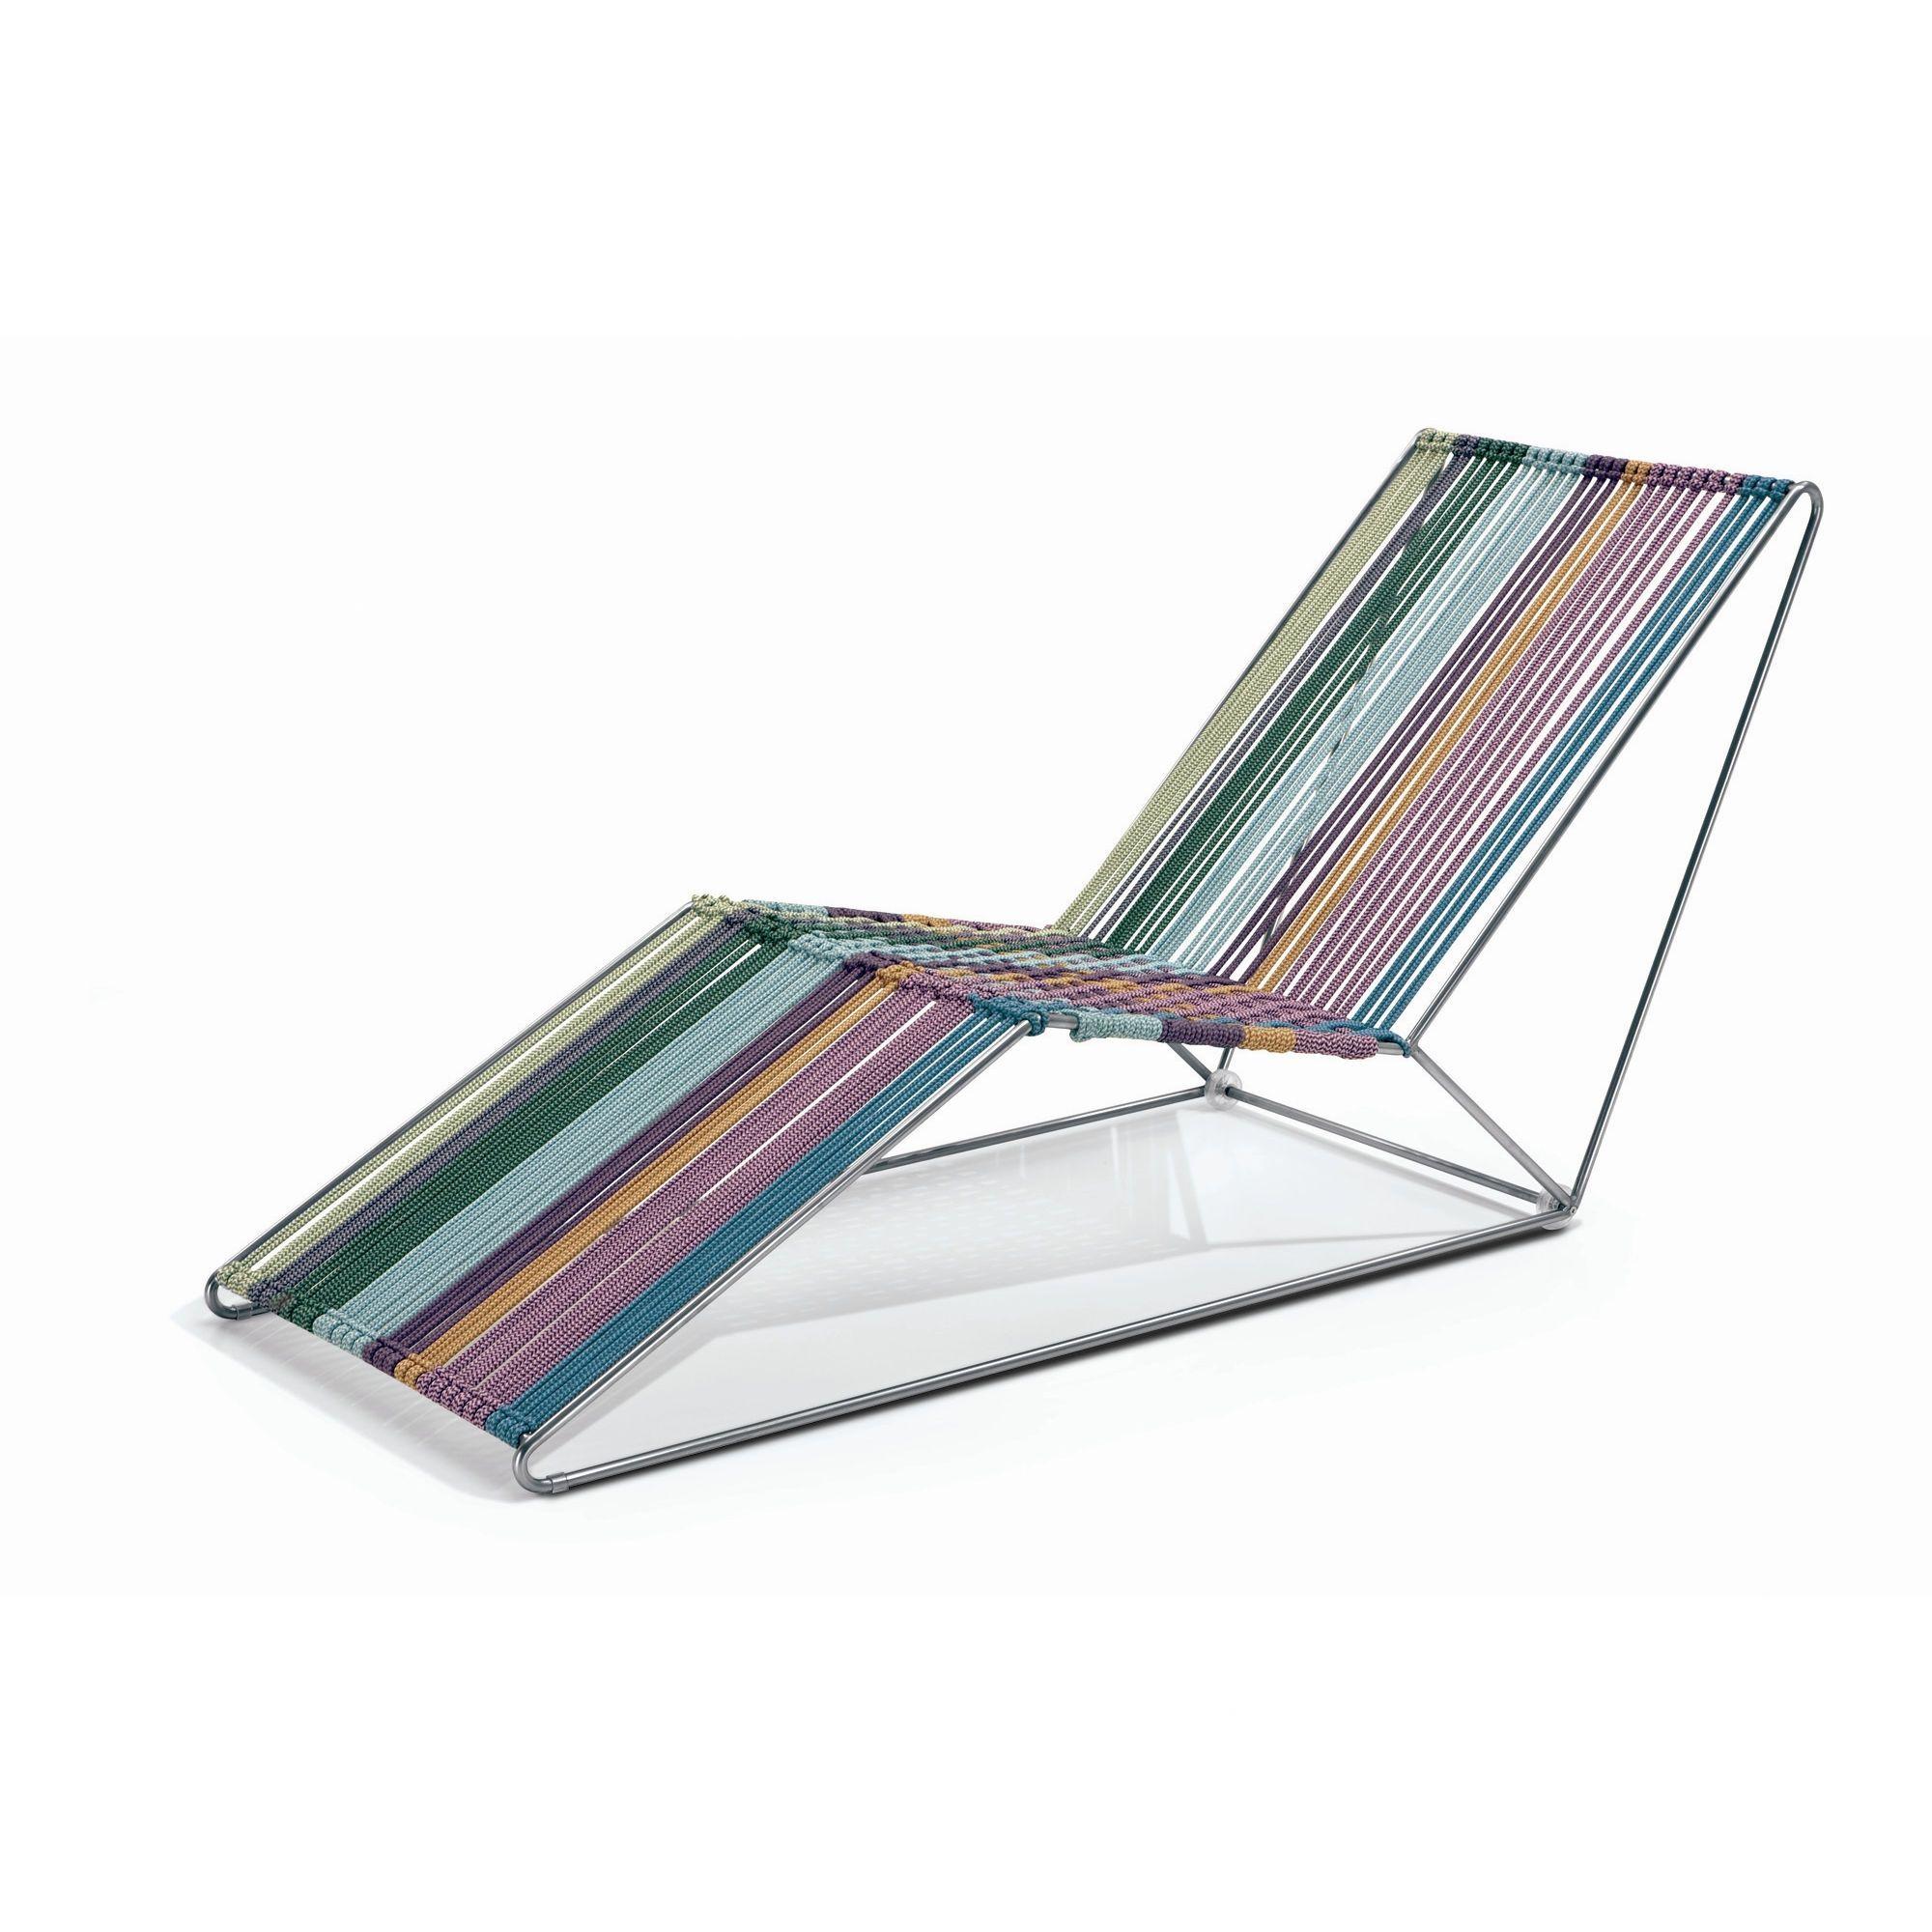 Missoni Home Cordula Chair: Missoni Home Cordula Chaise Longue